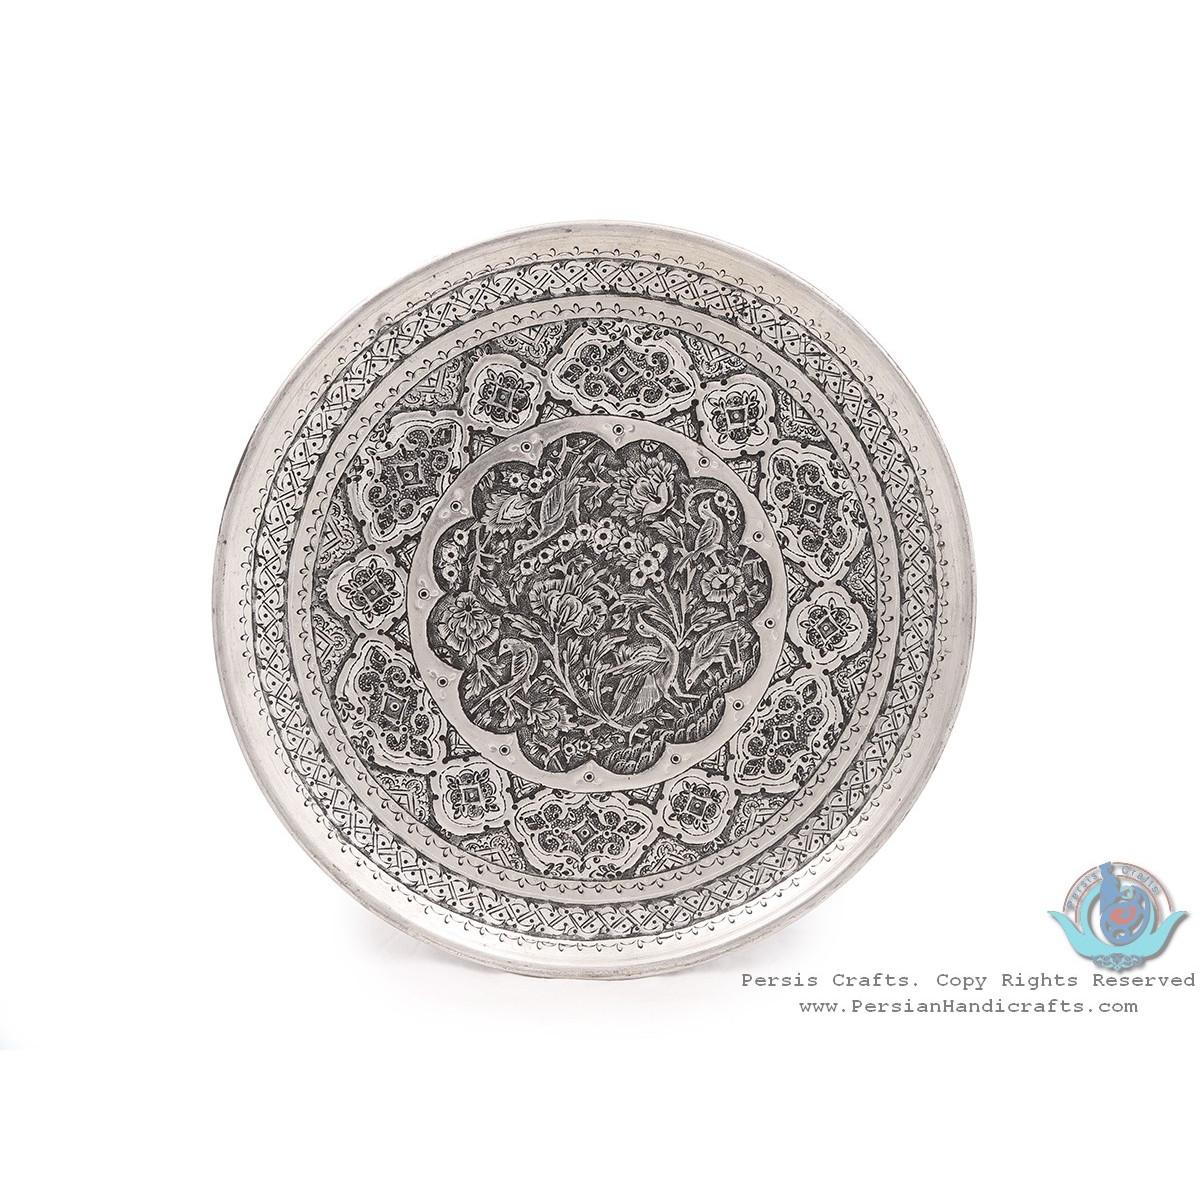 Handgraved Persian Flower & Bird on Wall Hanging Plate - HGL3905-Persian Handicrafts